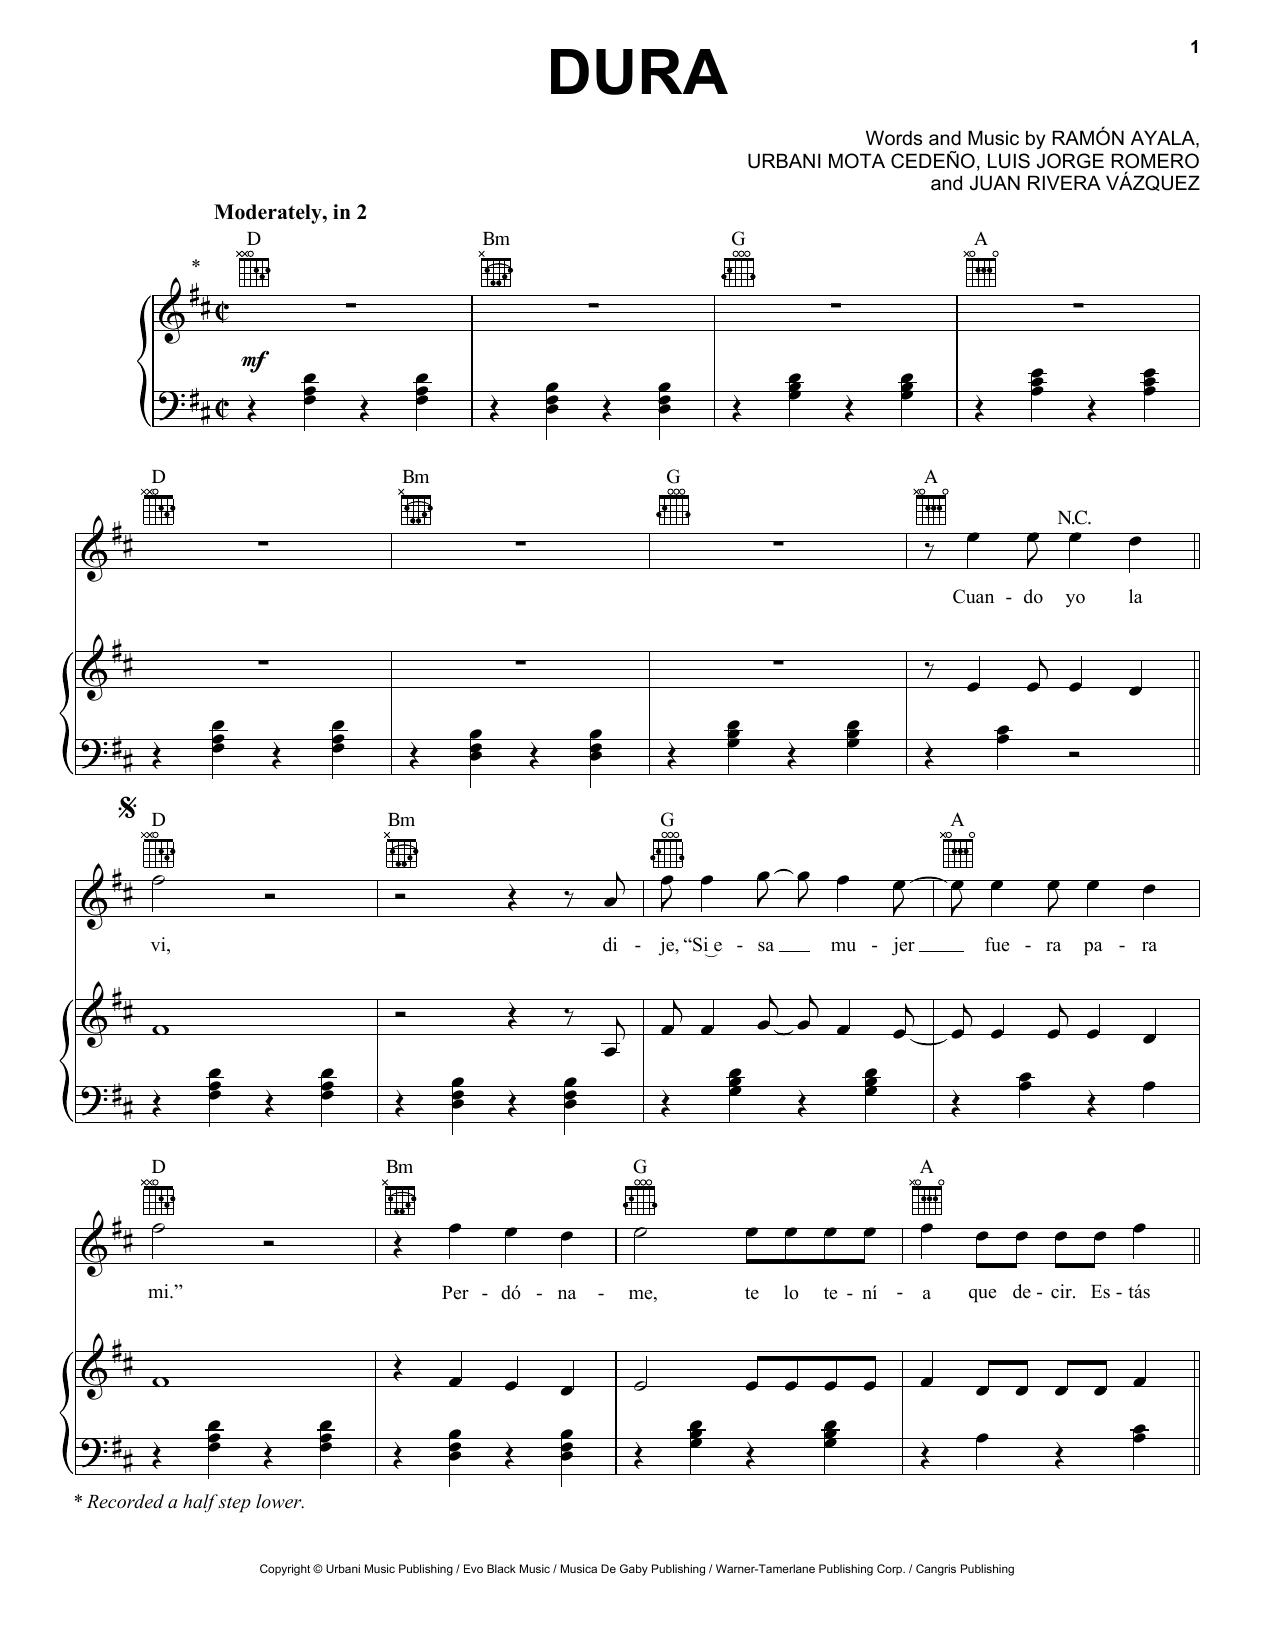 Daddy Yankee Dura Sheet Music Notes Chords Score Download Printable Pdf Sheet Music Notes Daddy Yankee Music Notes